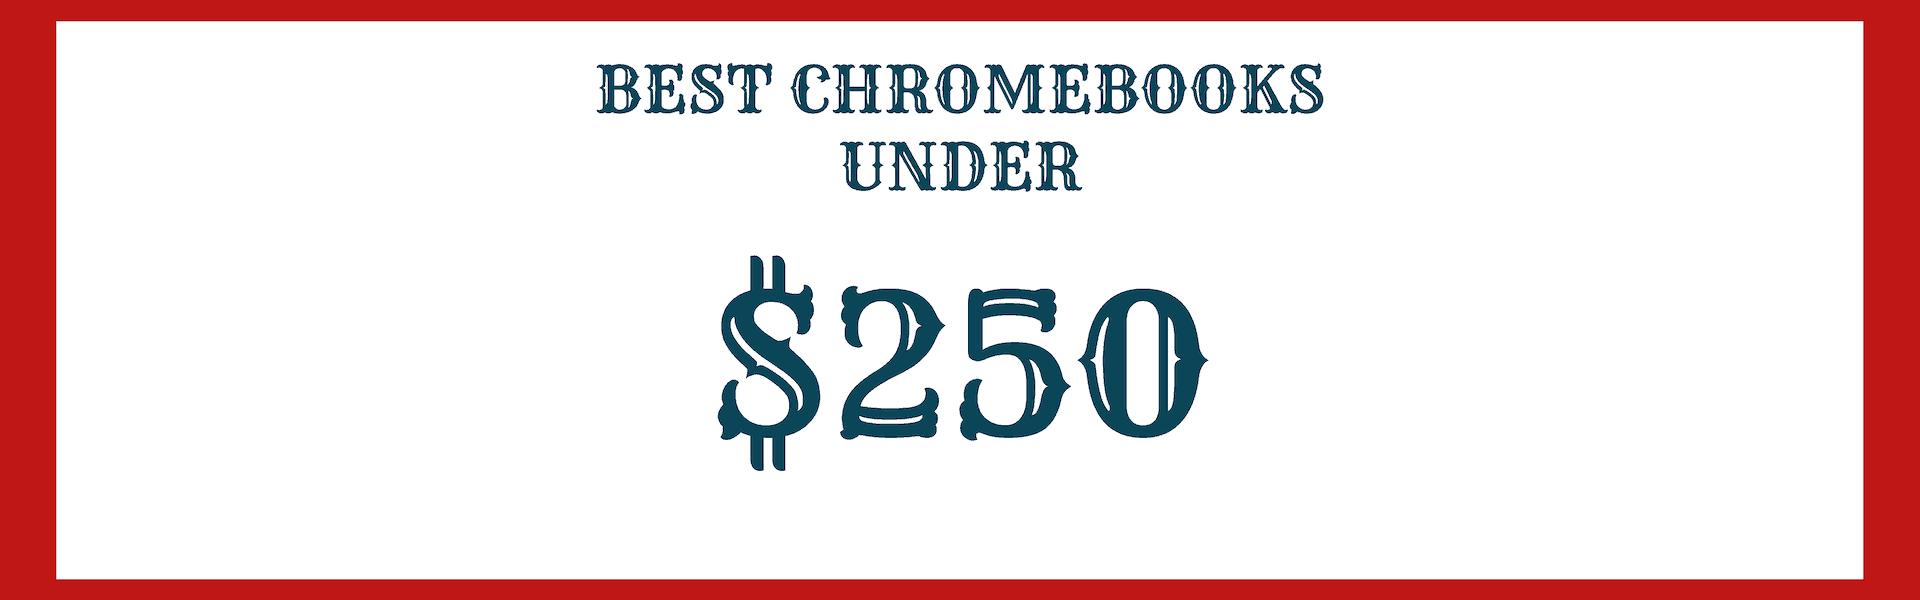 best chromebooks under 250